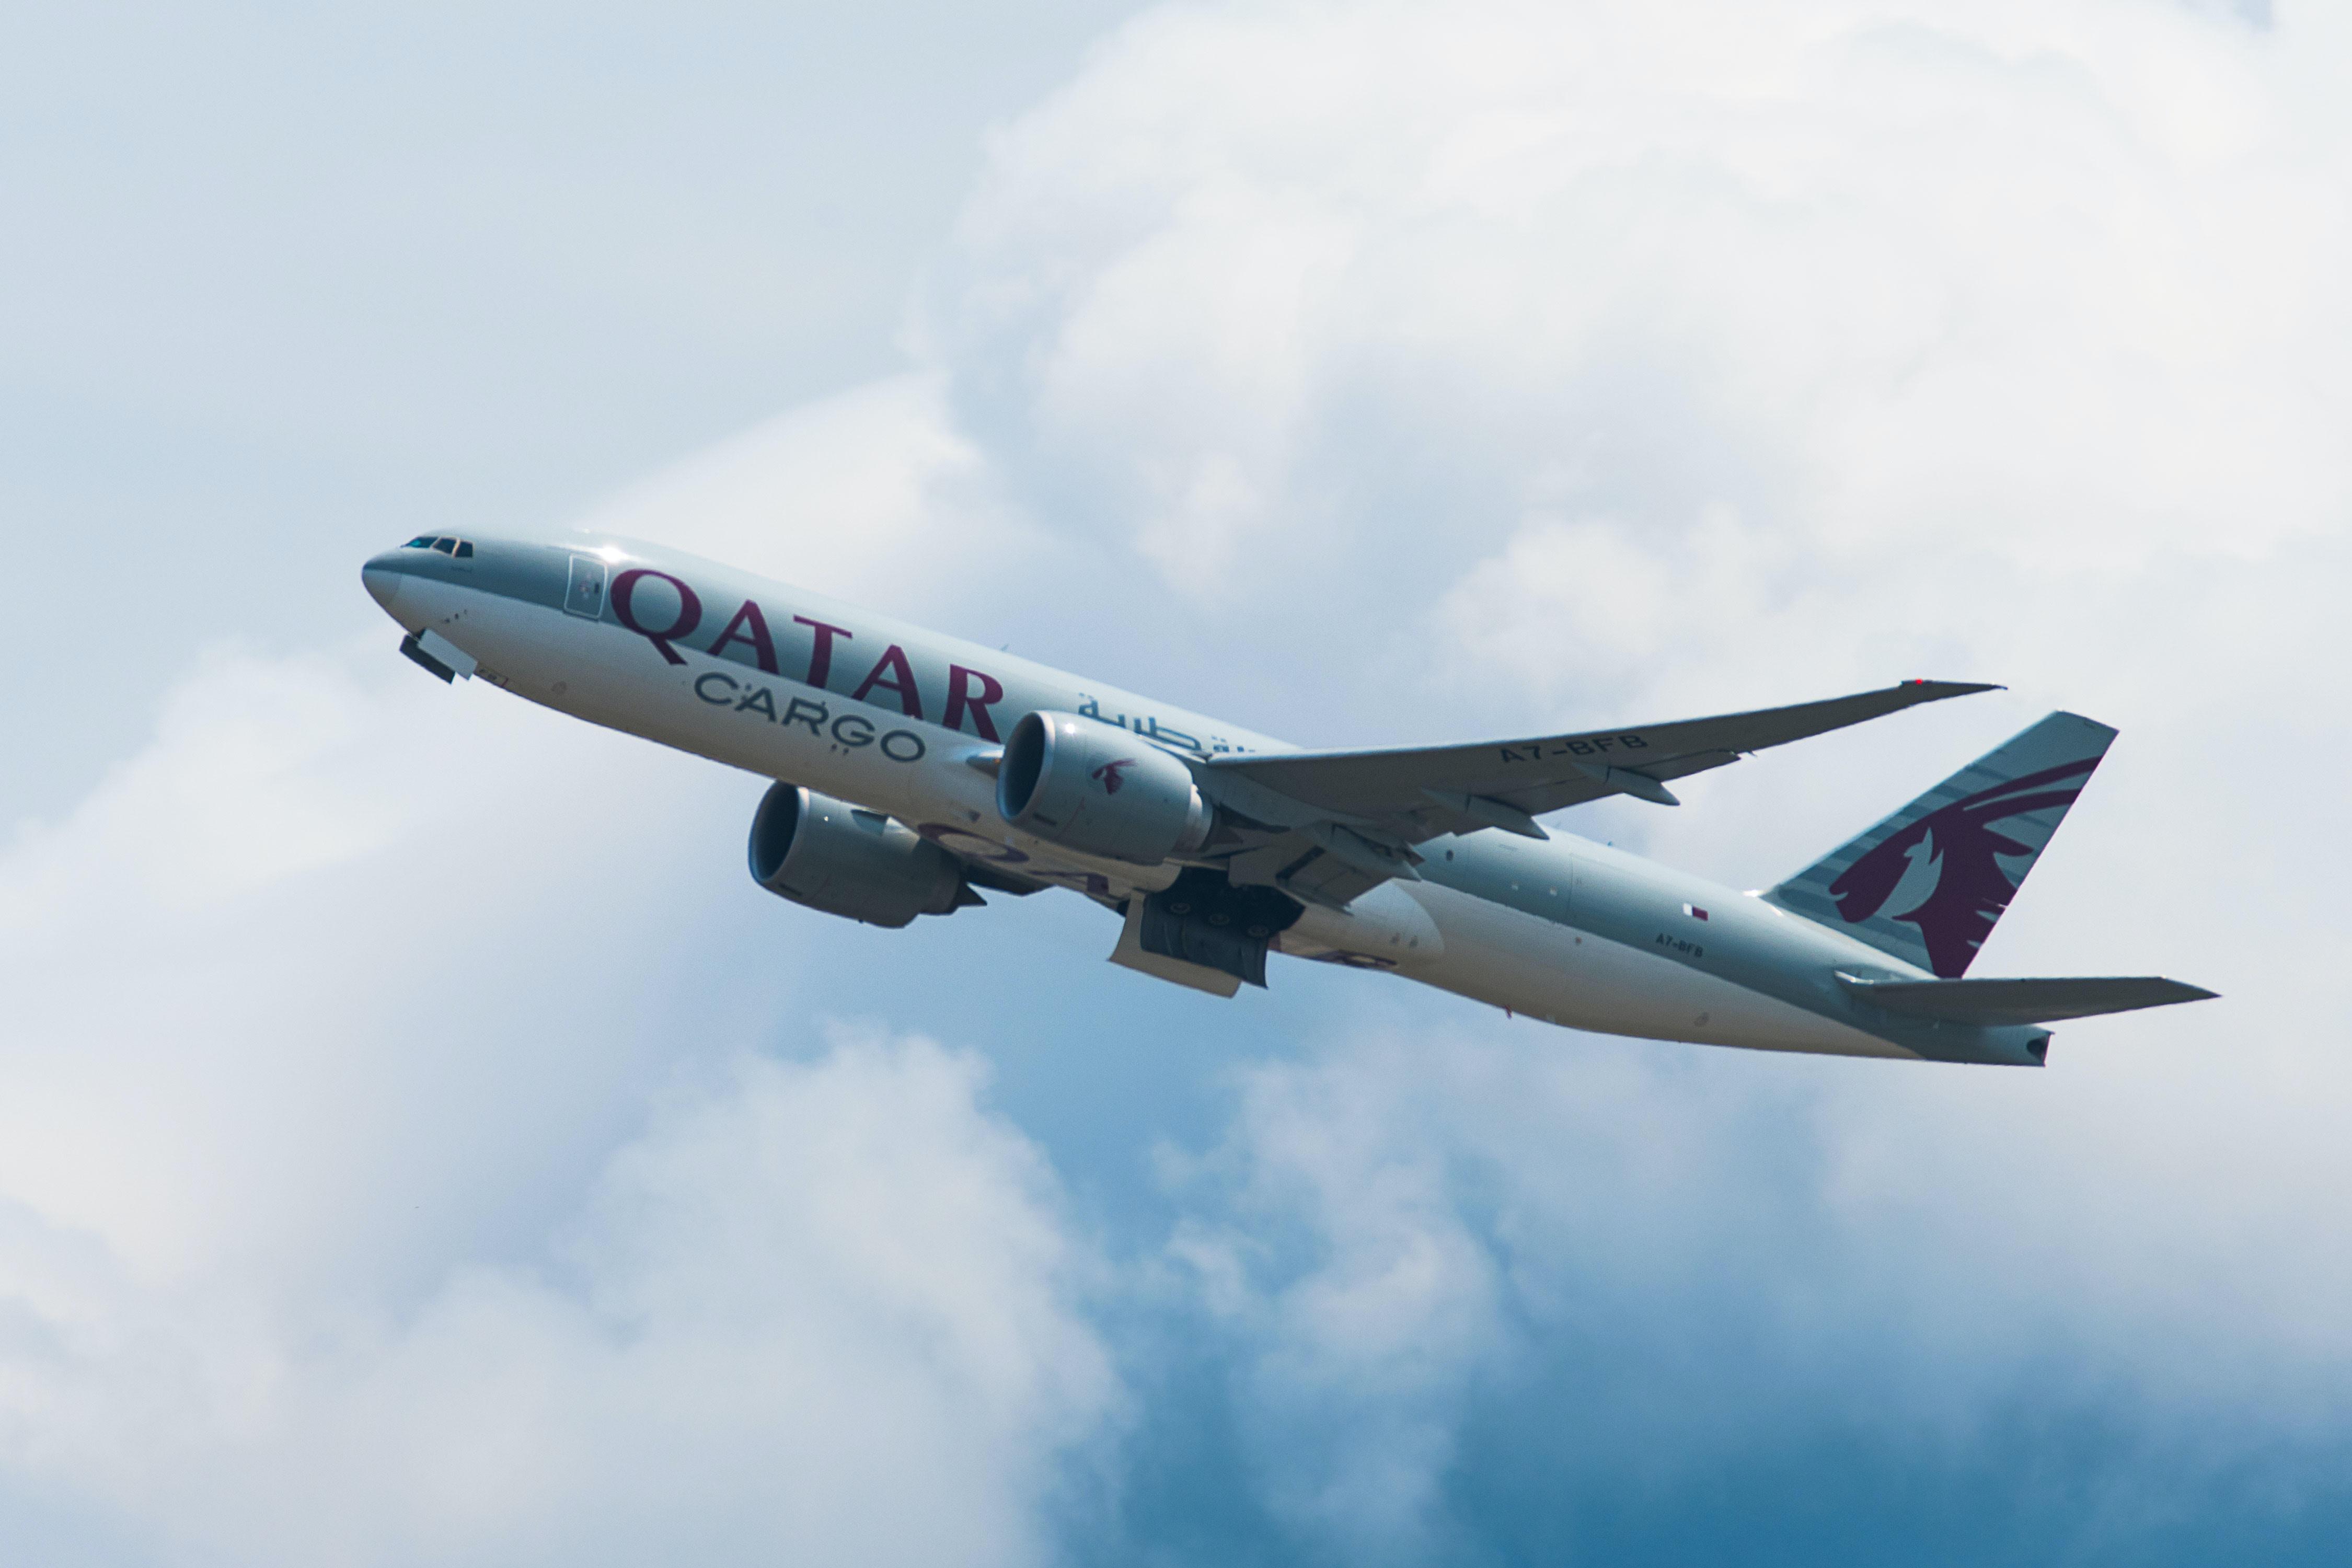 gray and white Qatar Cargo plane on mid sky taken under white cloudy sky taken at daytime